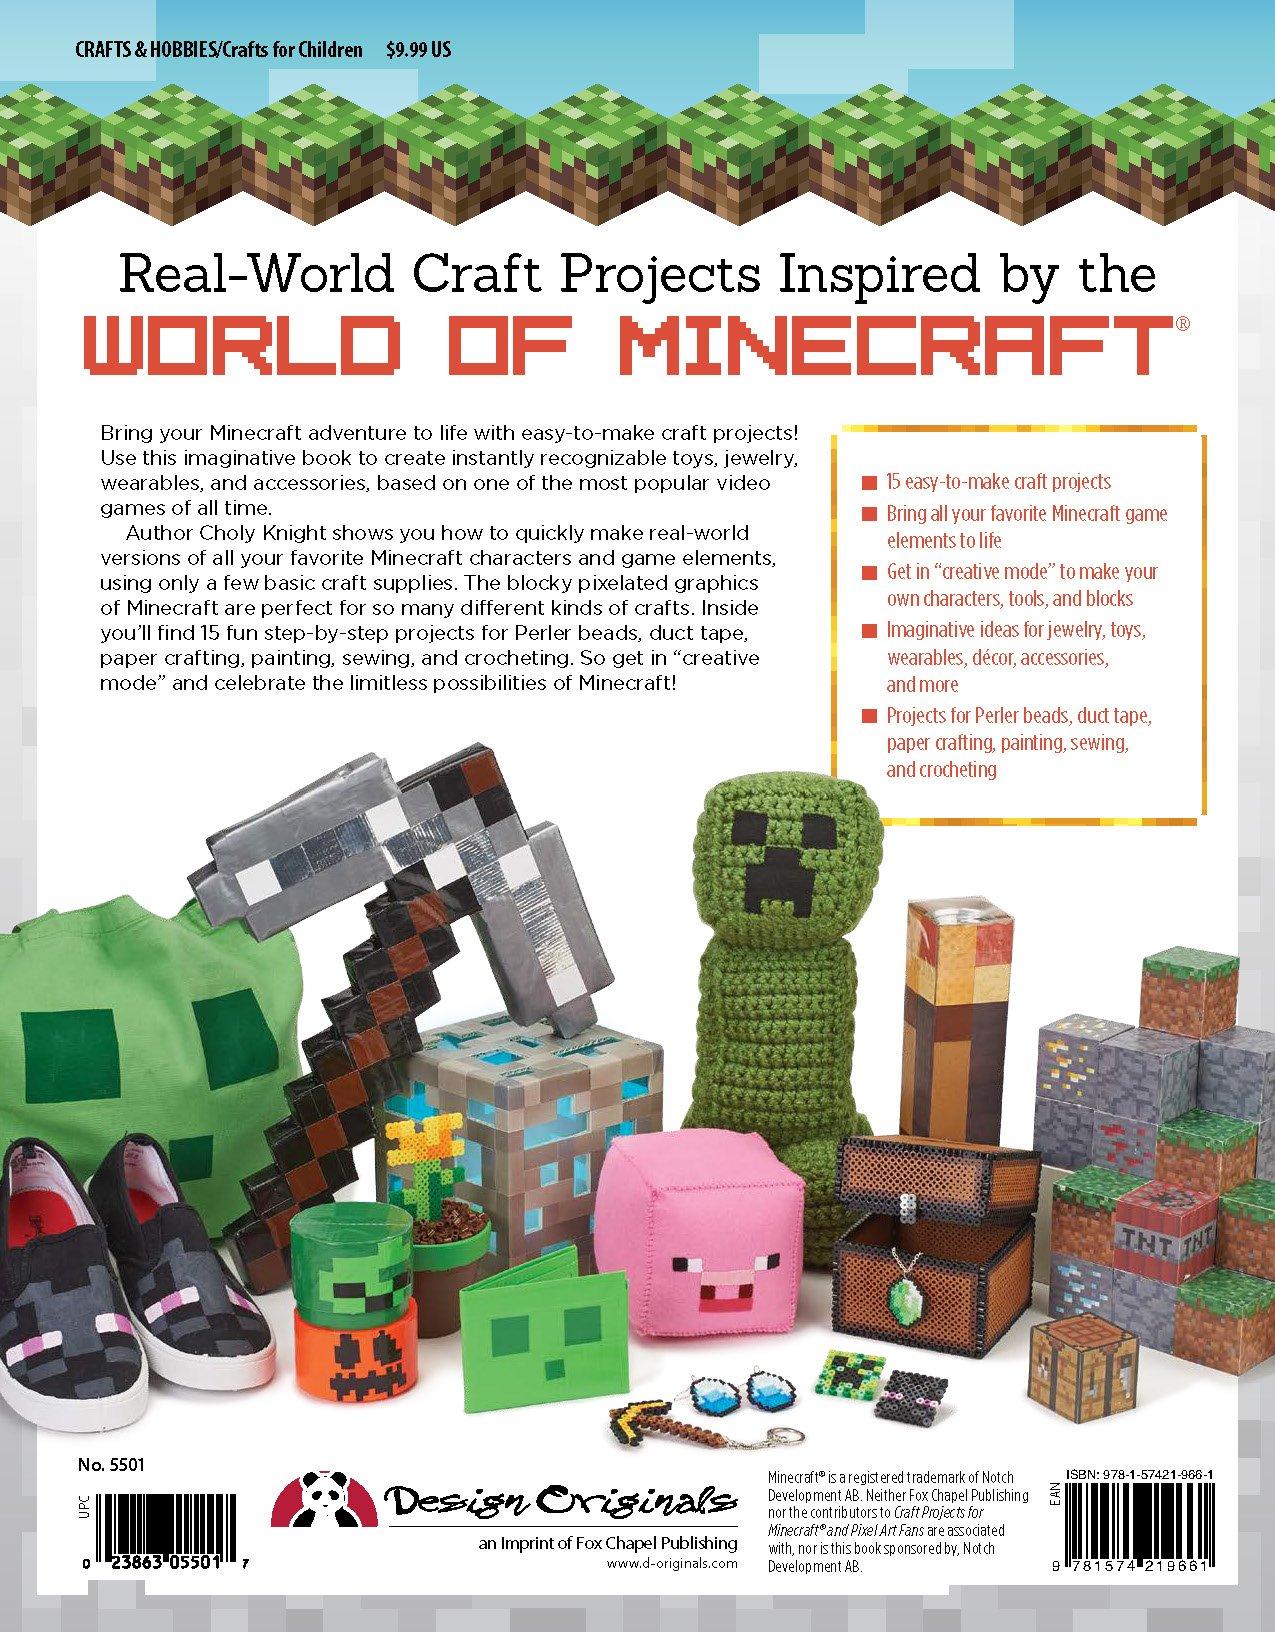 Craft Projects For Minecraft And Pixel Art Fans Fun EasyToMake - Paper minecraft jetzt spielen